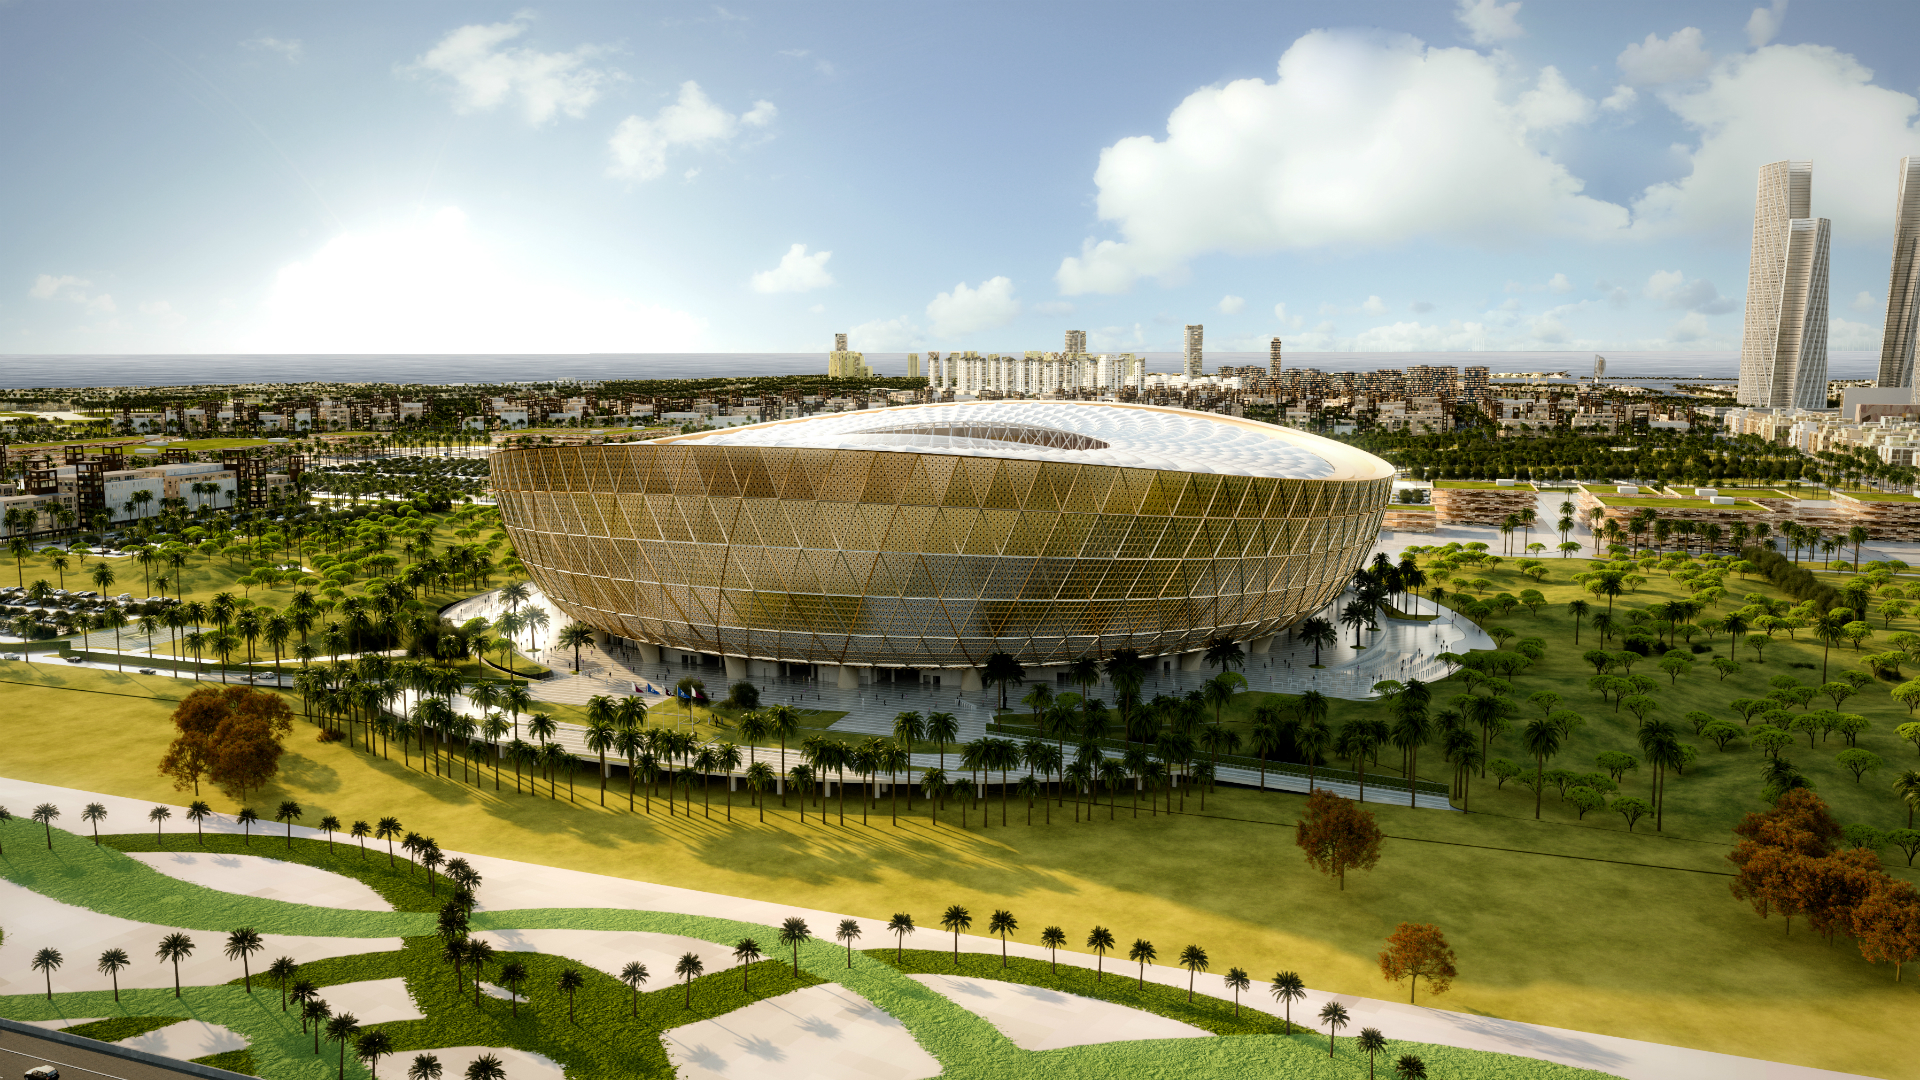 Qatar unveils Lusail Stadium for 2022 World Cup